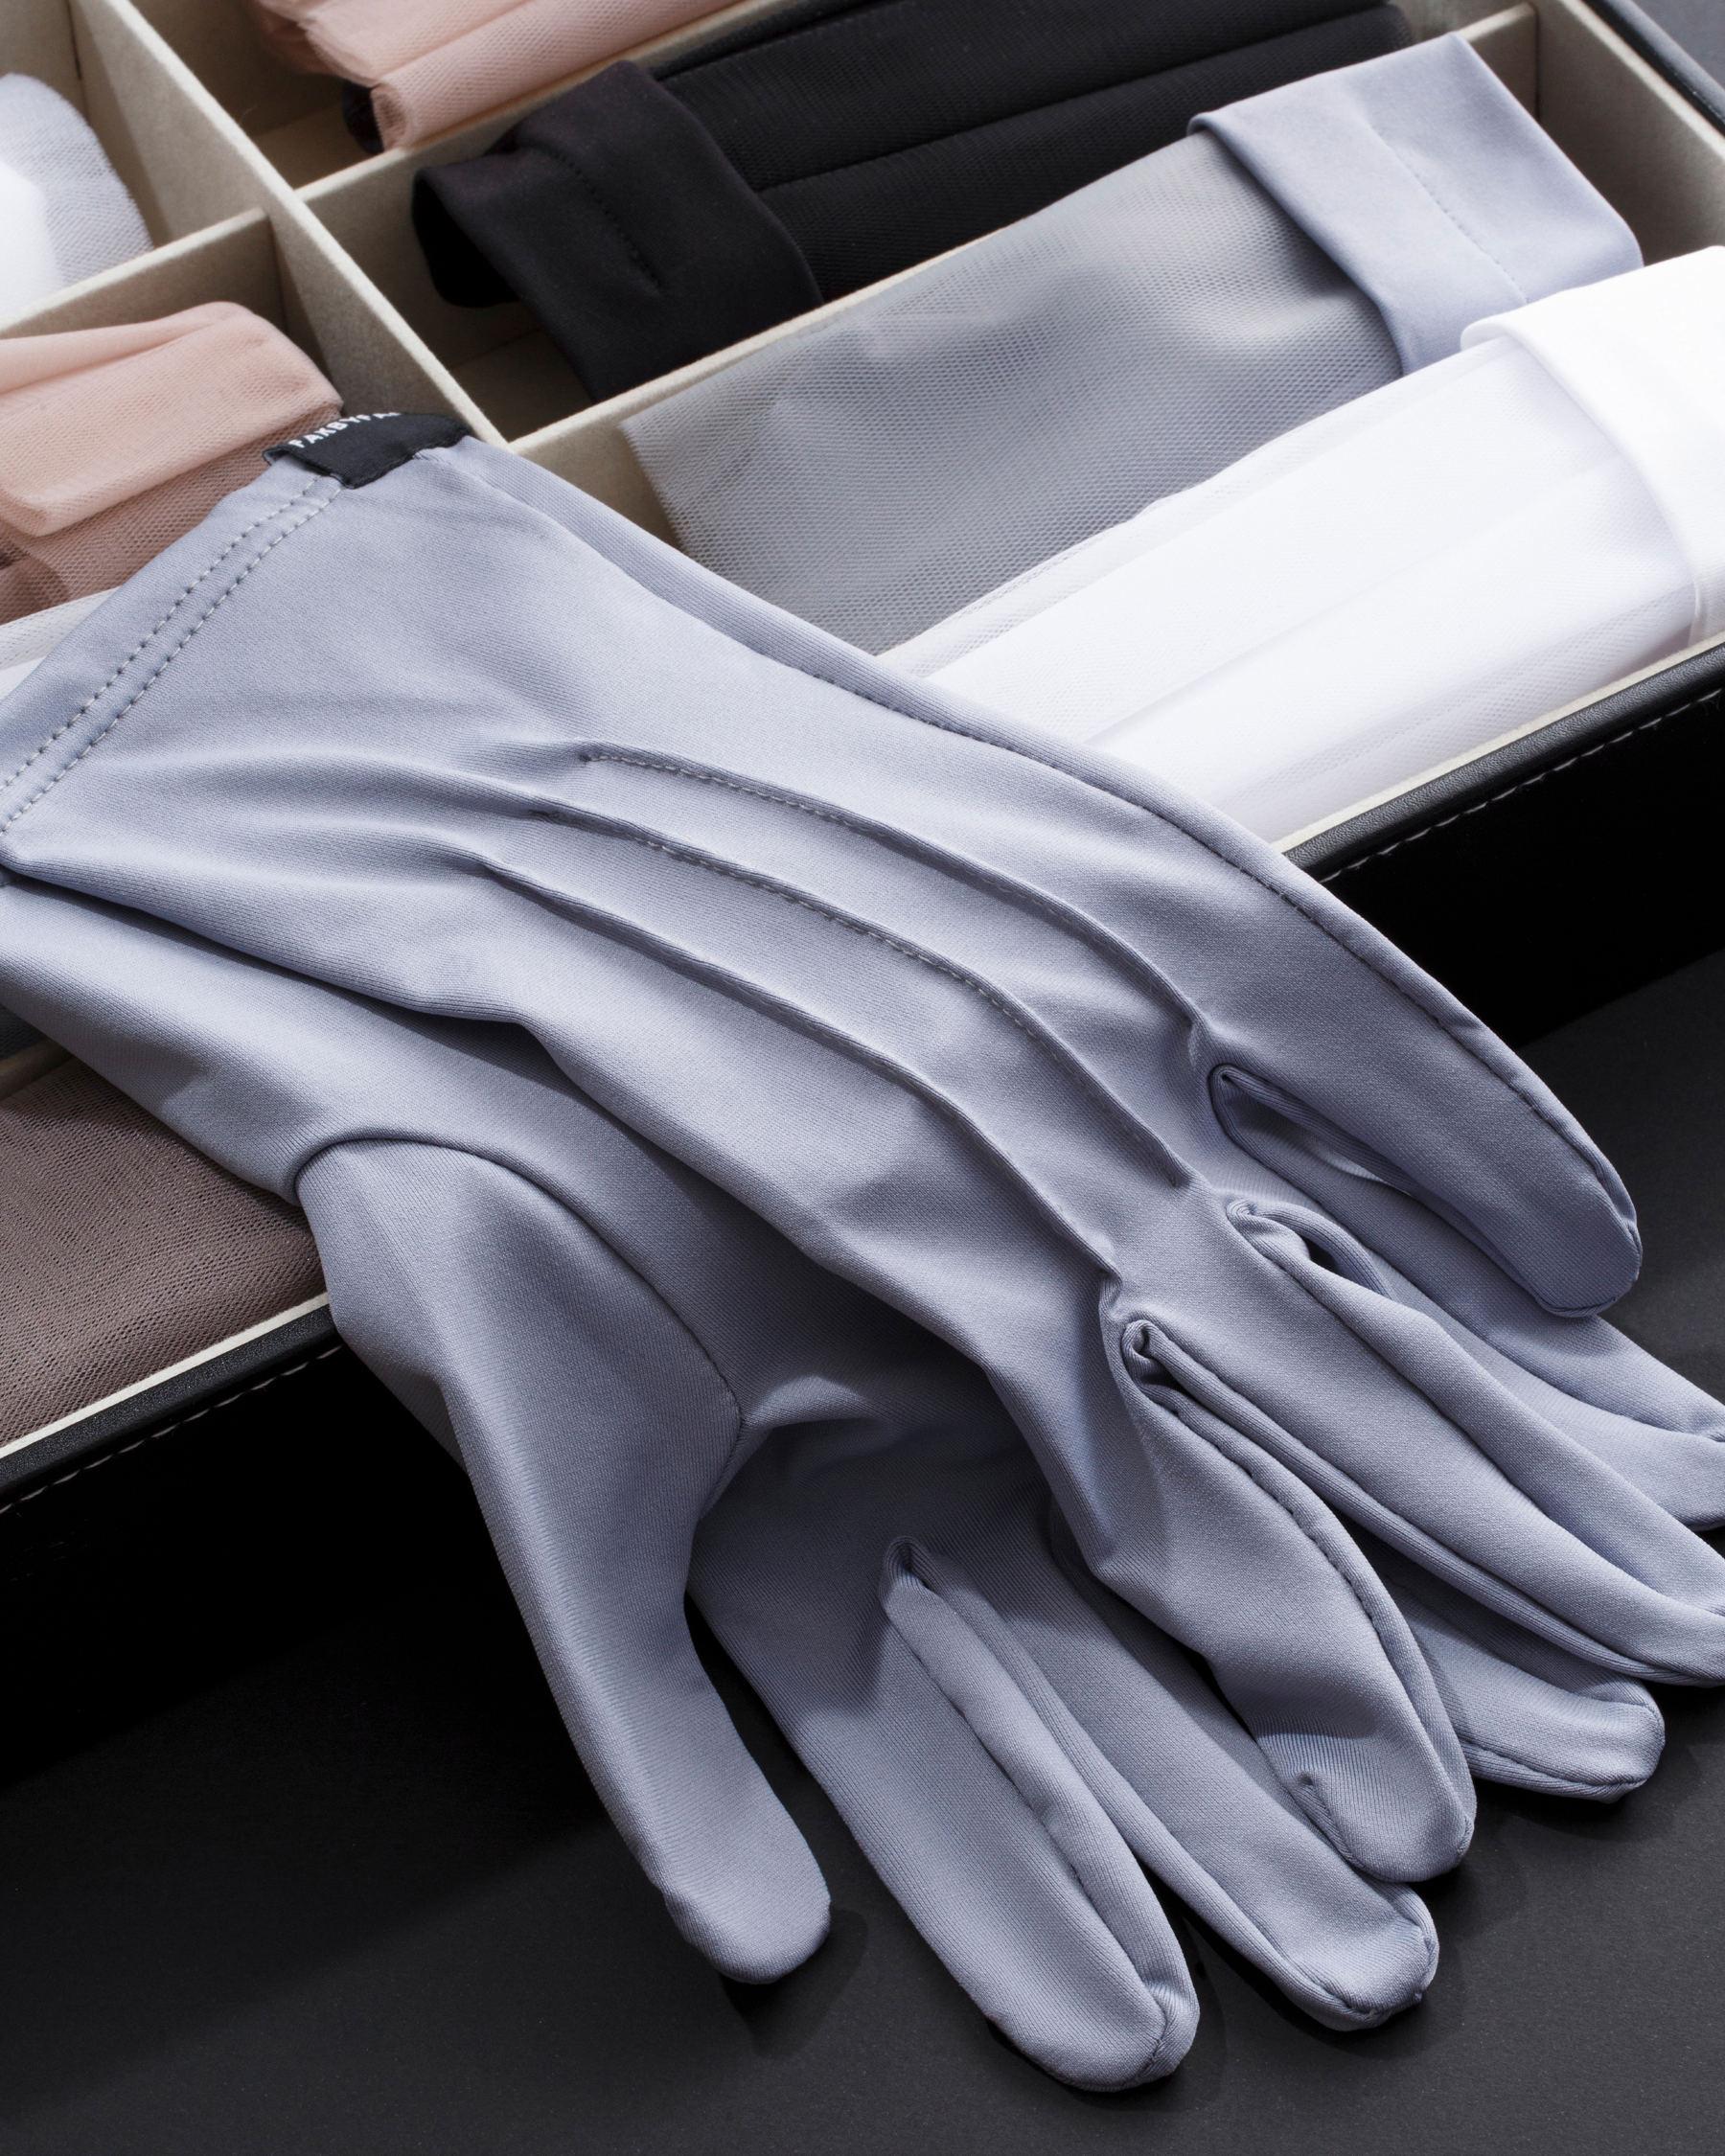 FAKBYFAK  The Vega. Fine Protective Antibacterial (ATB-UV+) Unisex Gloves. Grey Code: FBF-41101-03